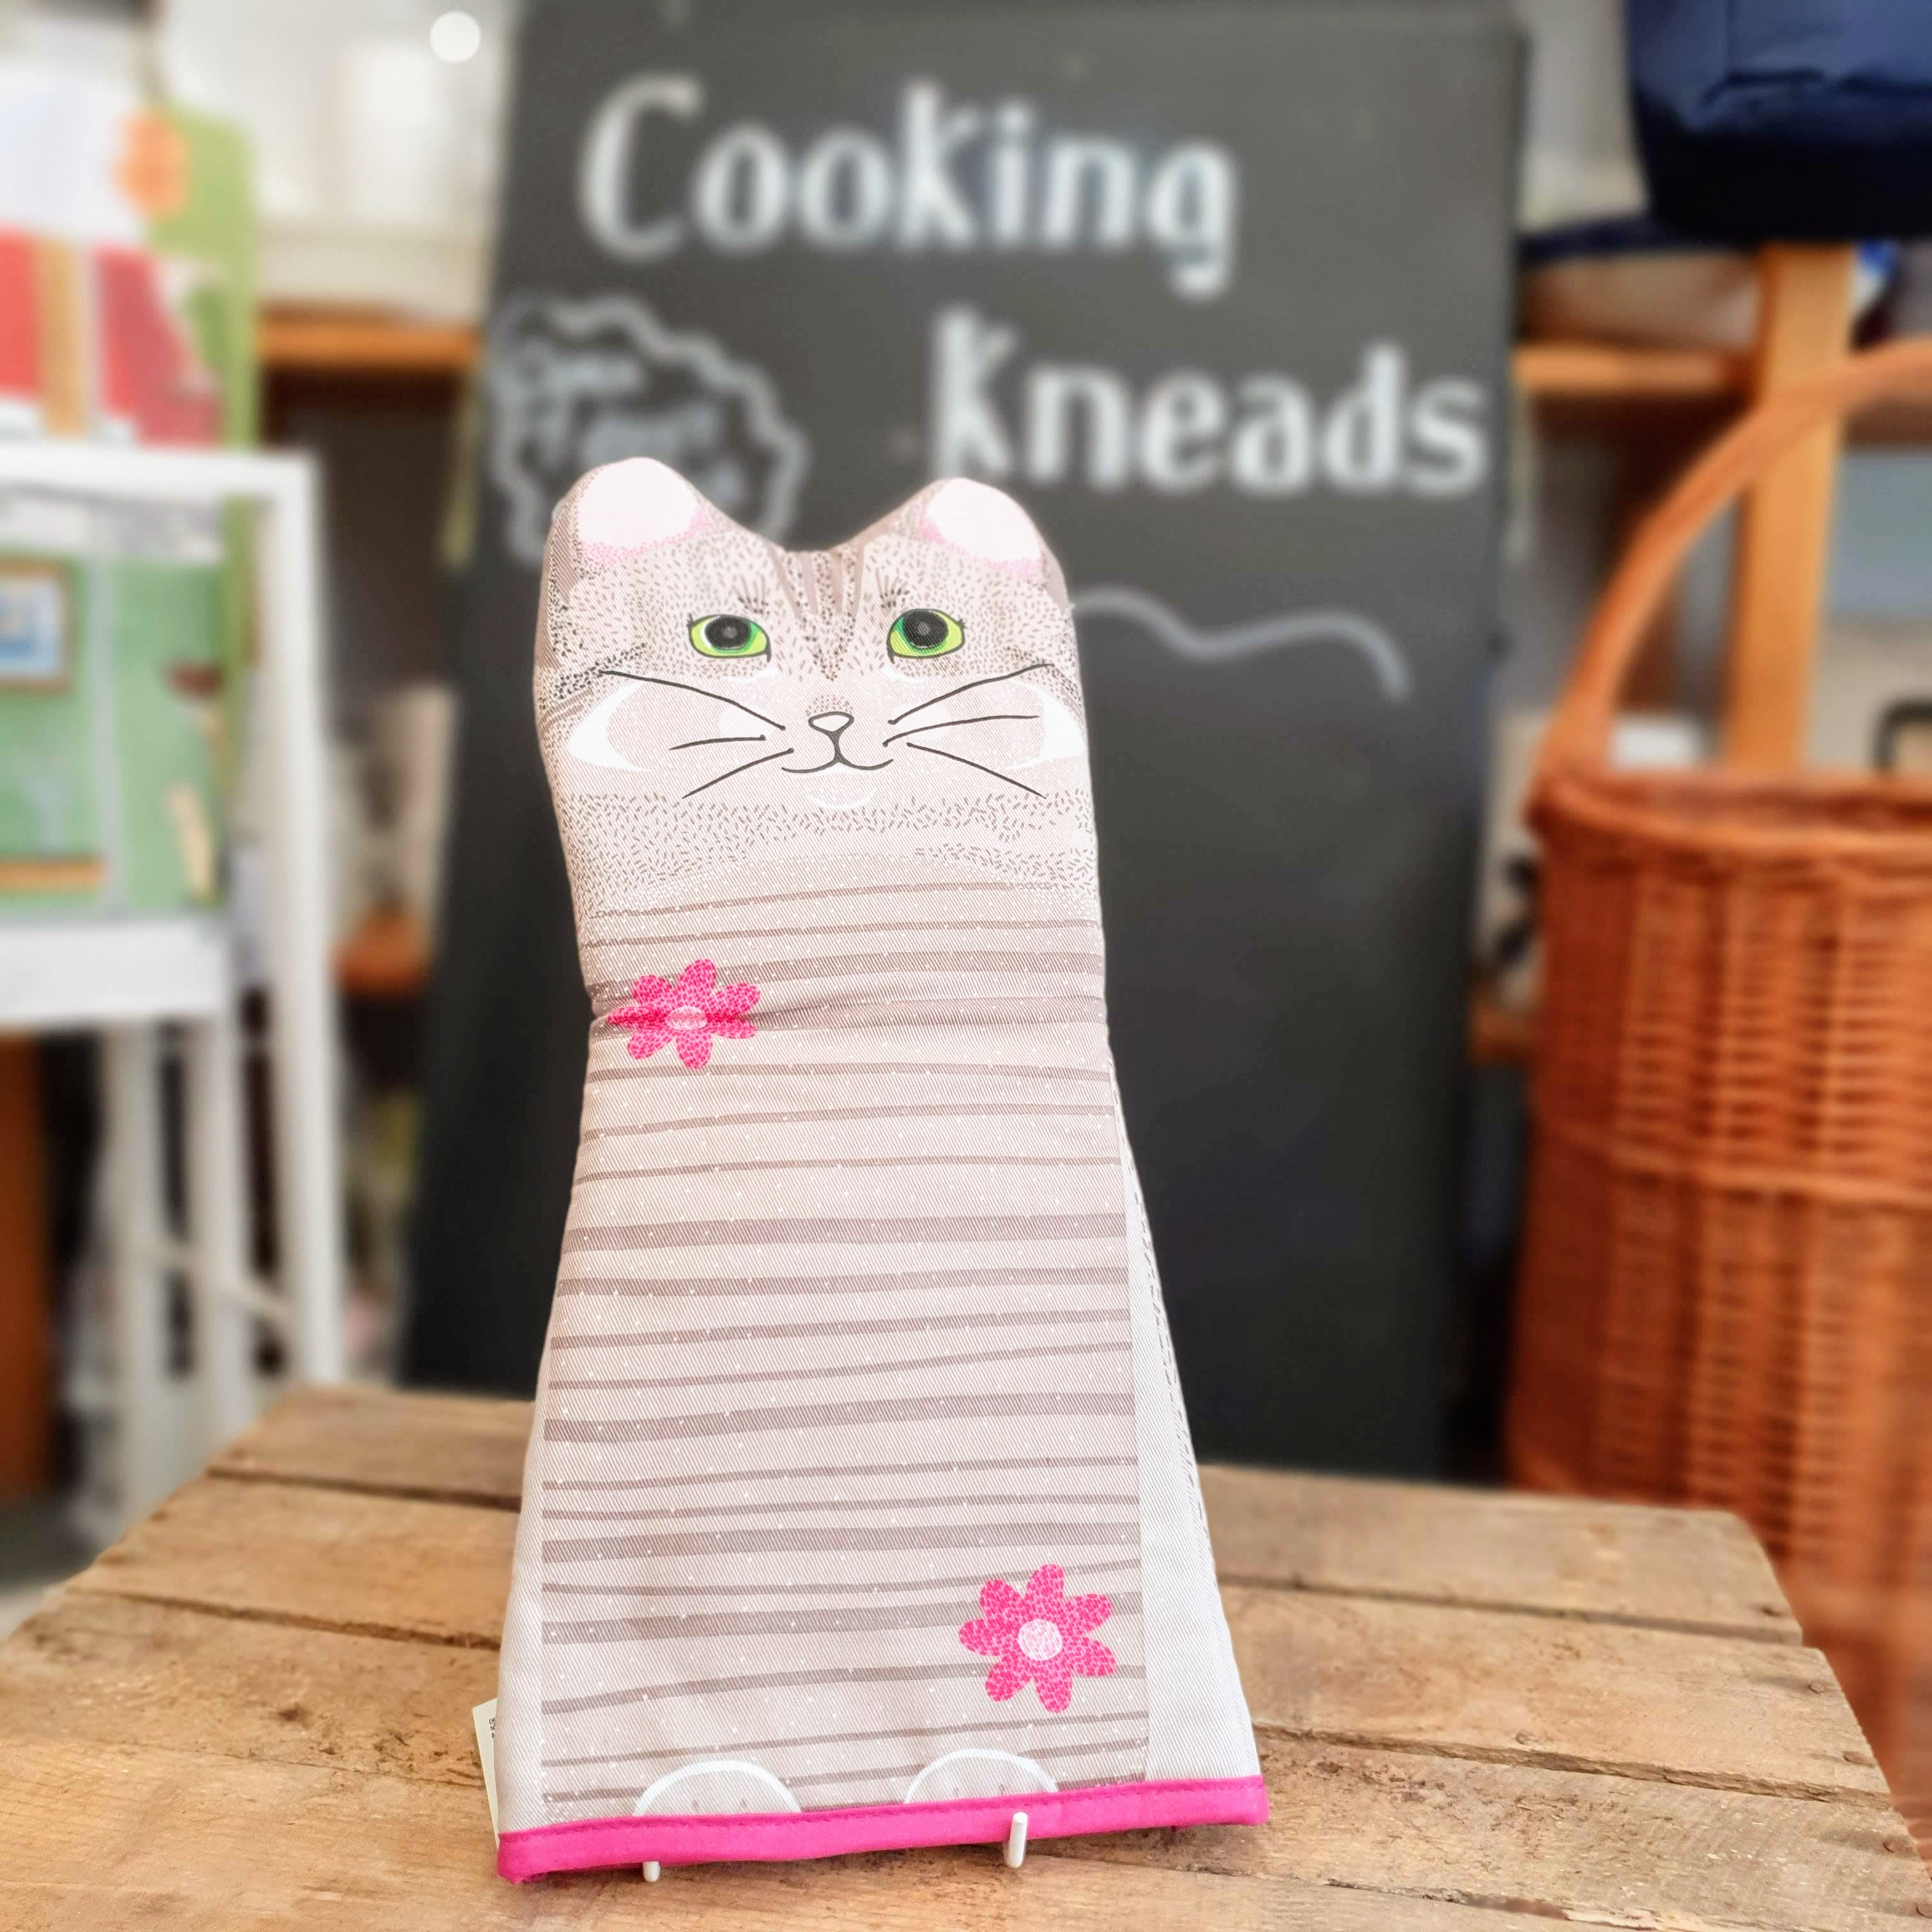 Oven glove cat